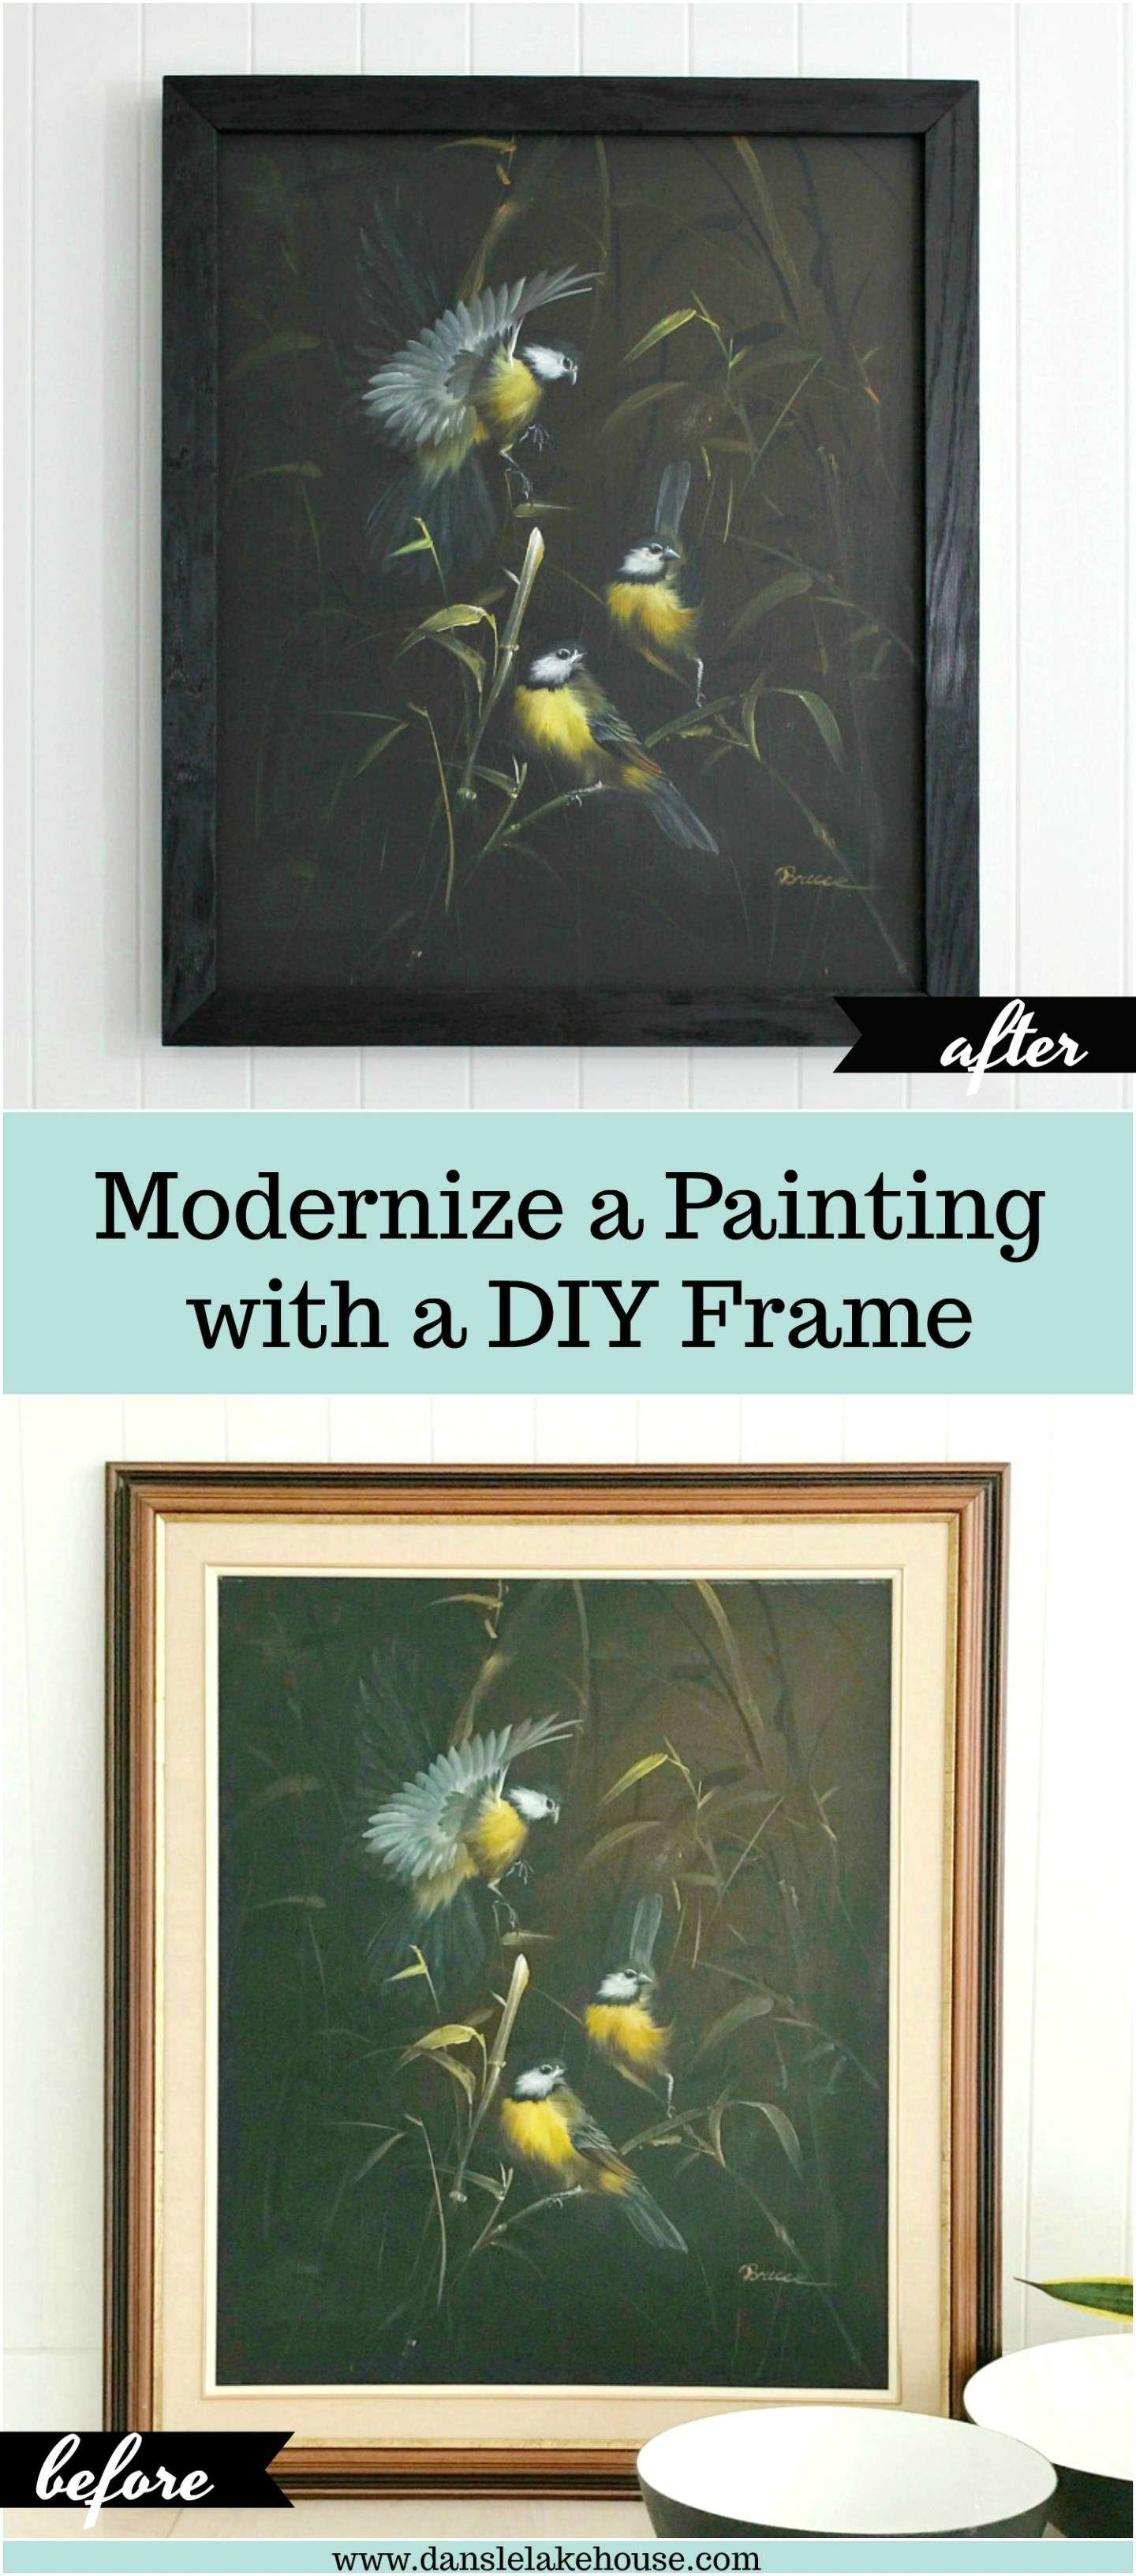 DIY wood burn frame tutorial